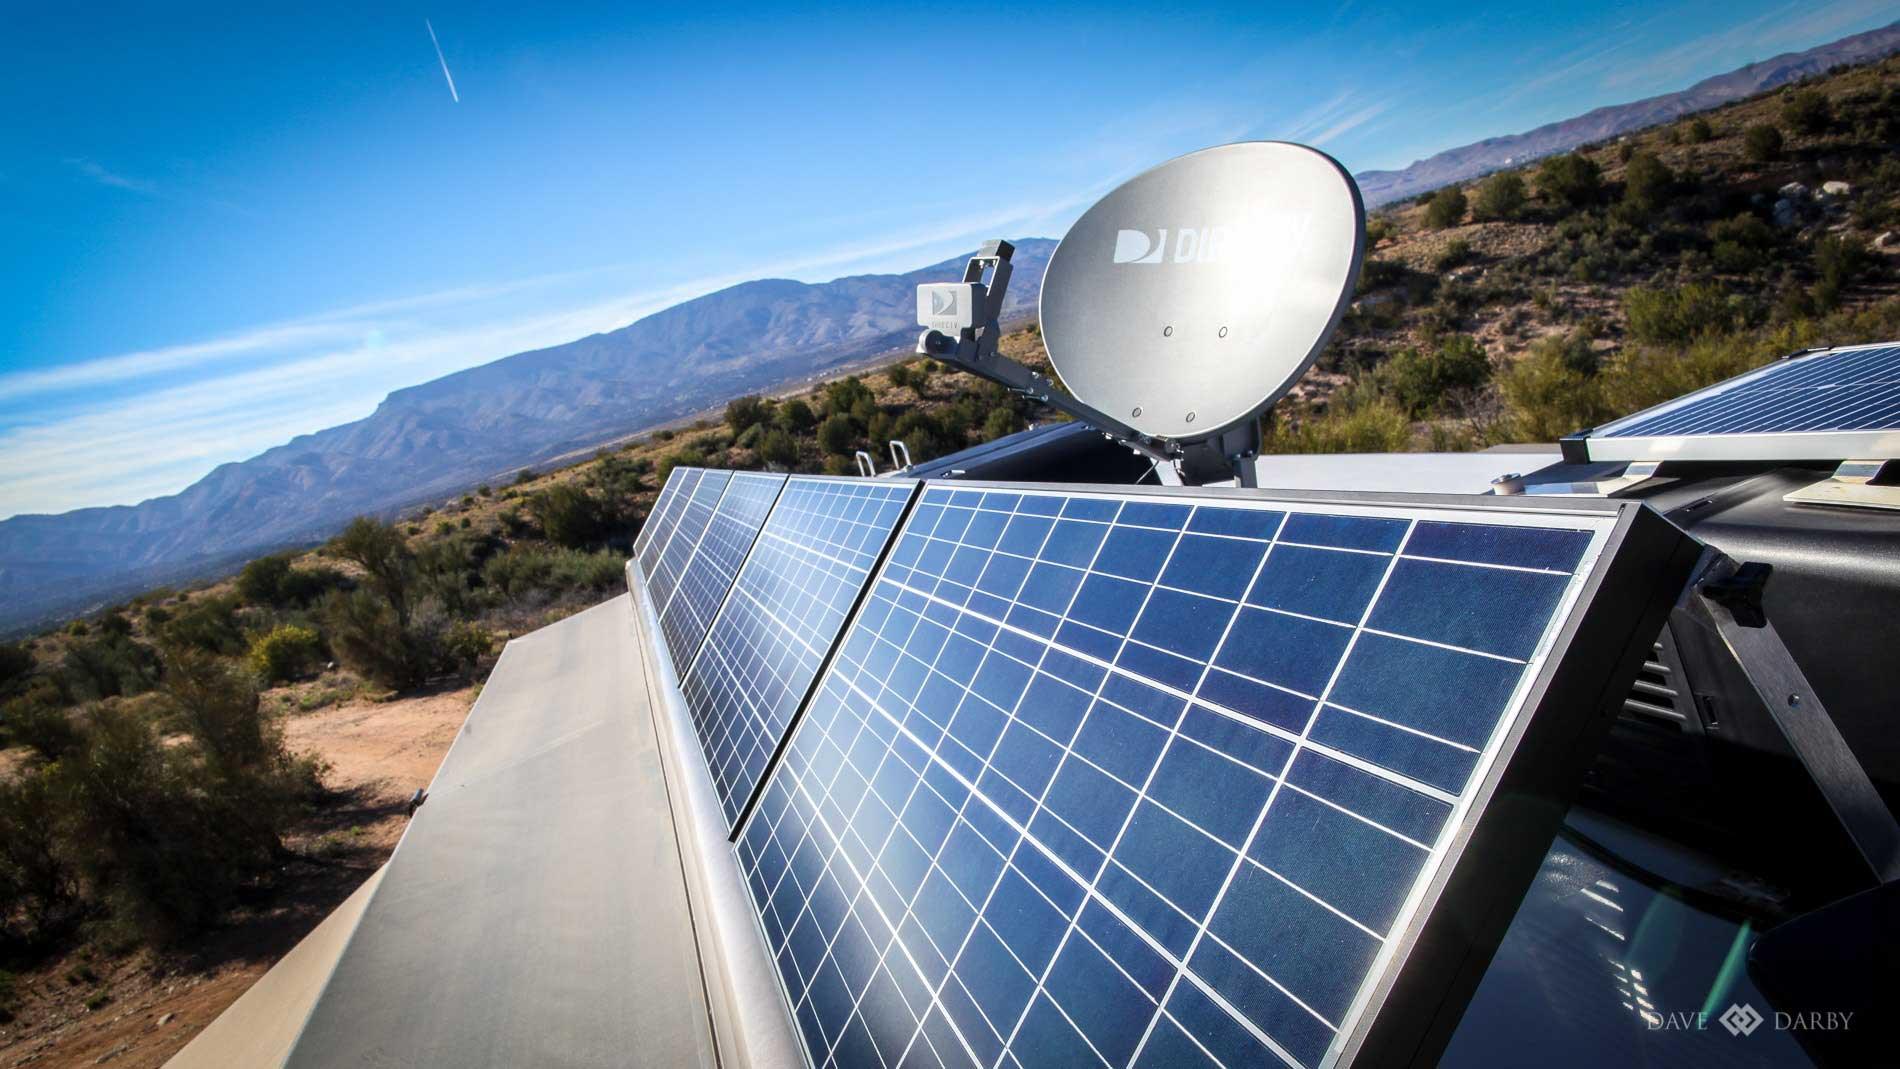 RV Wild Camping on Solar